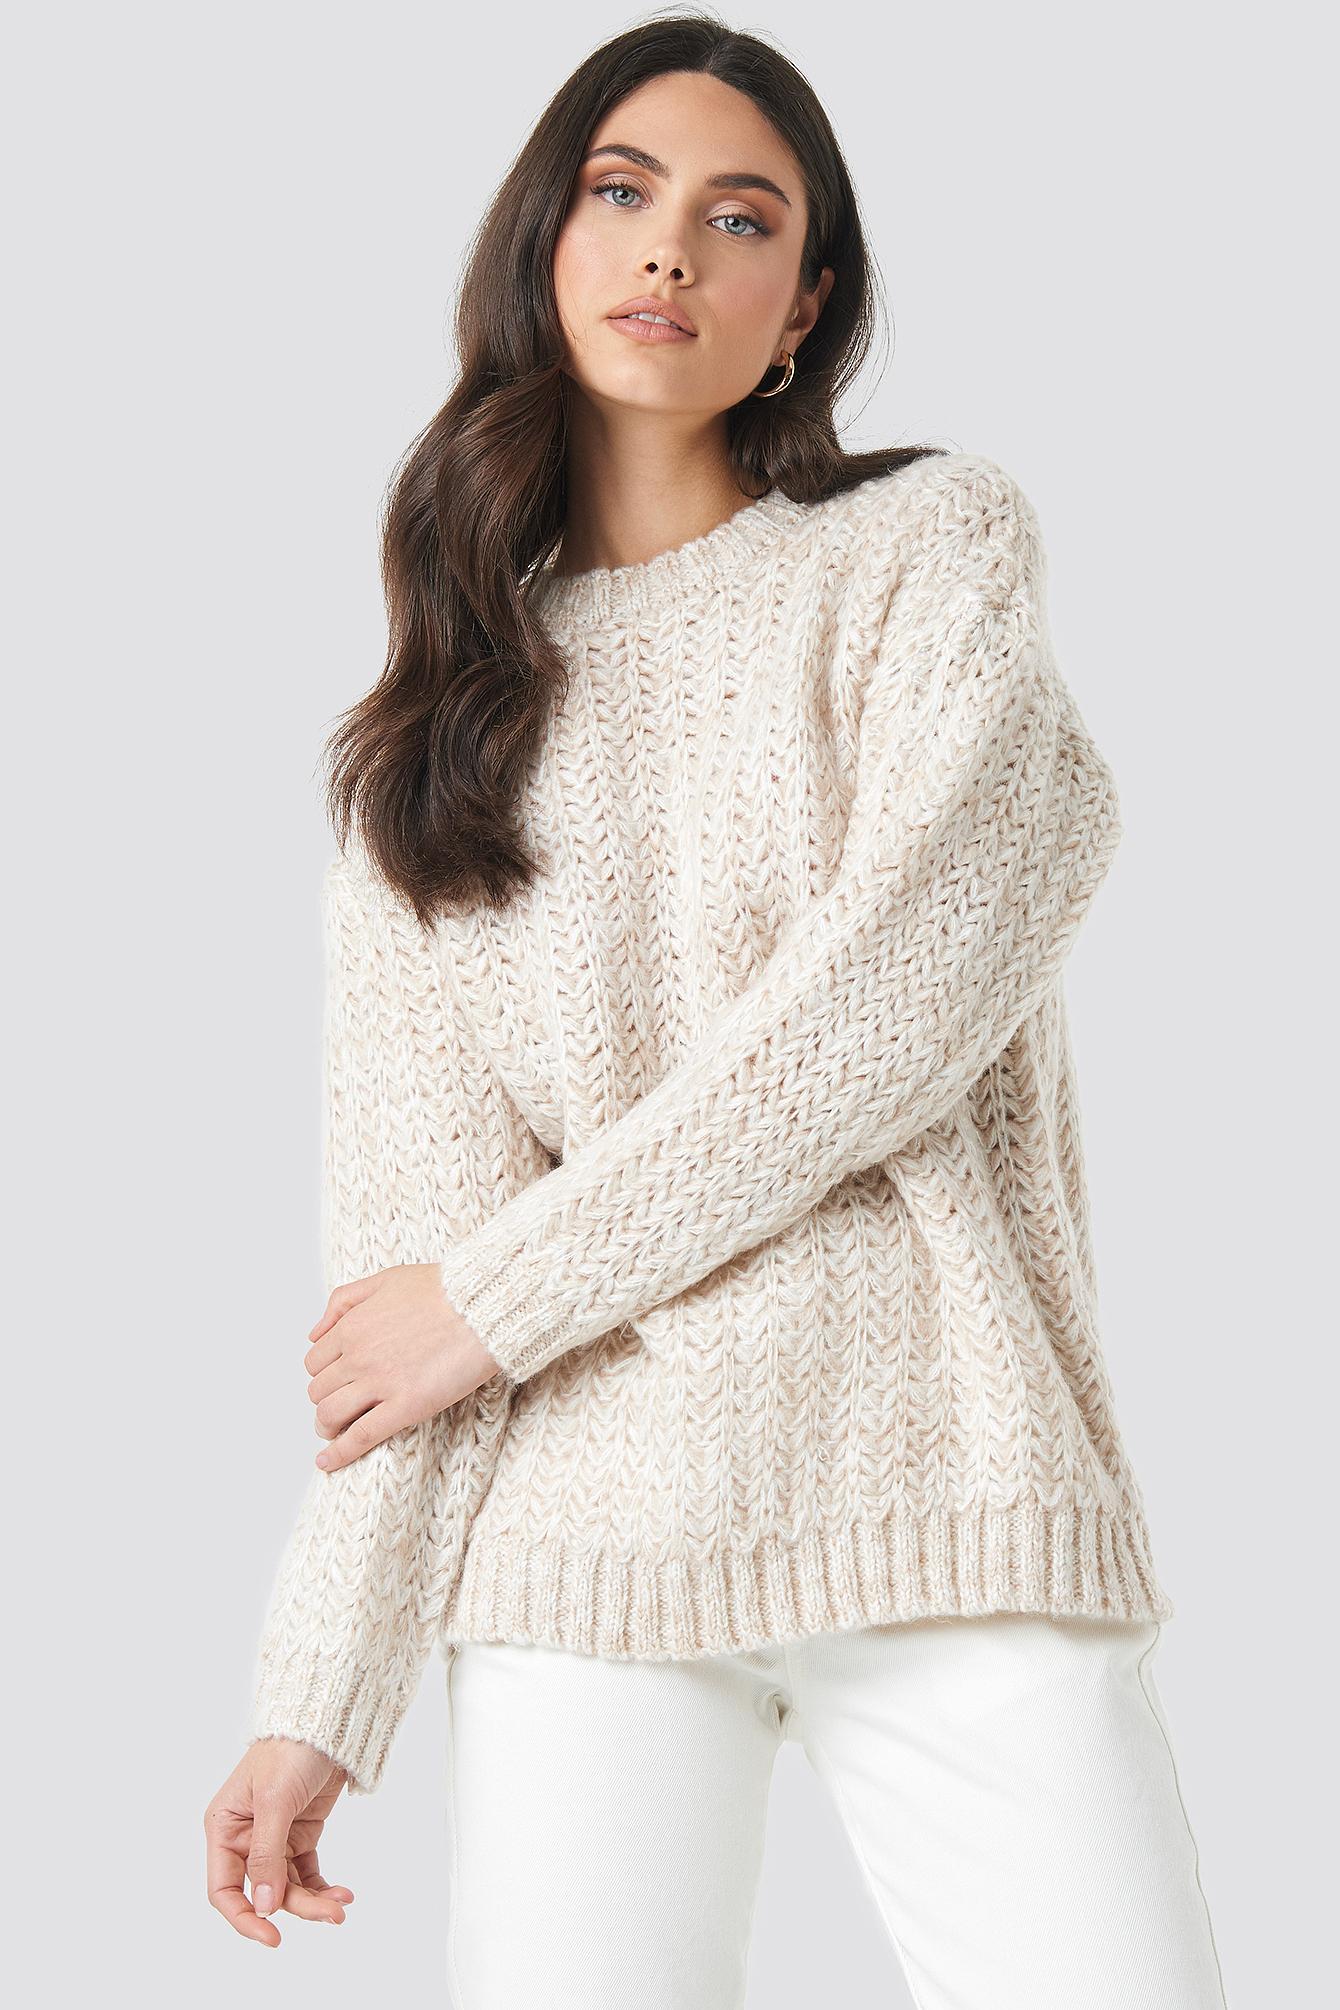 mango -  Tauro Sweater - White,Beige